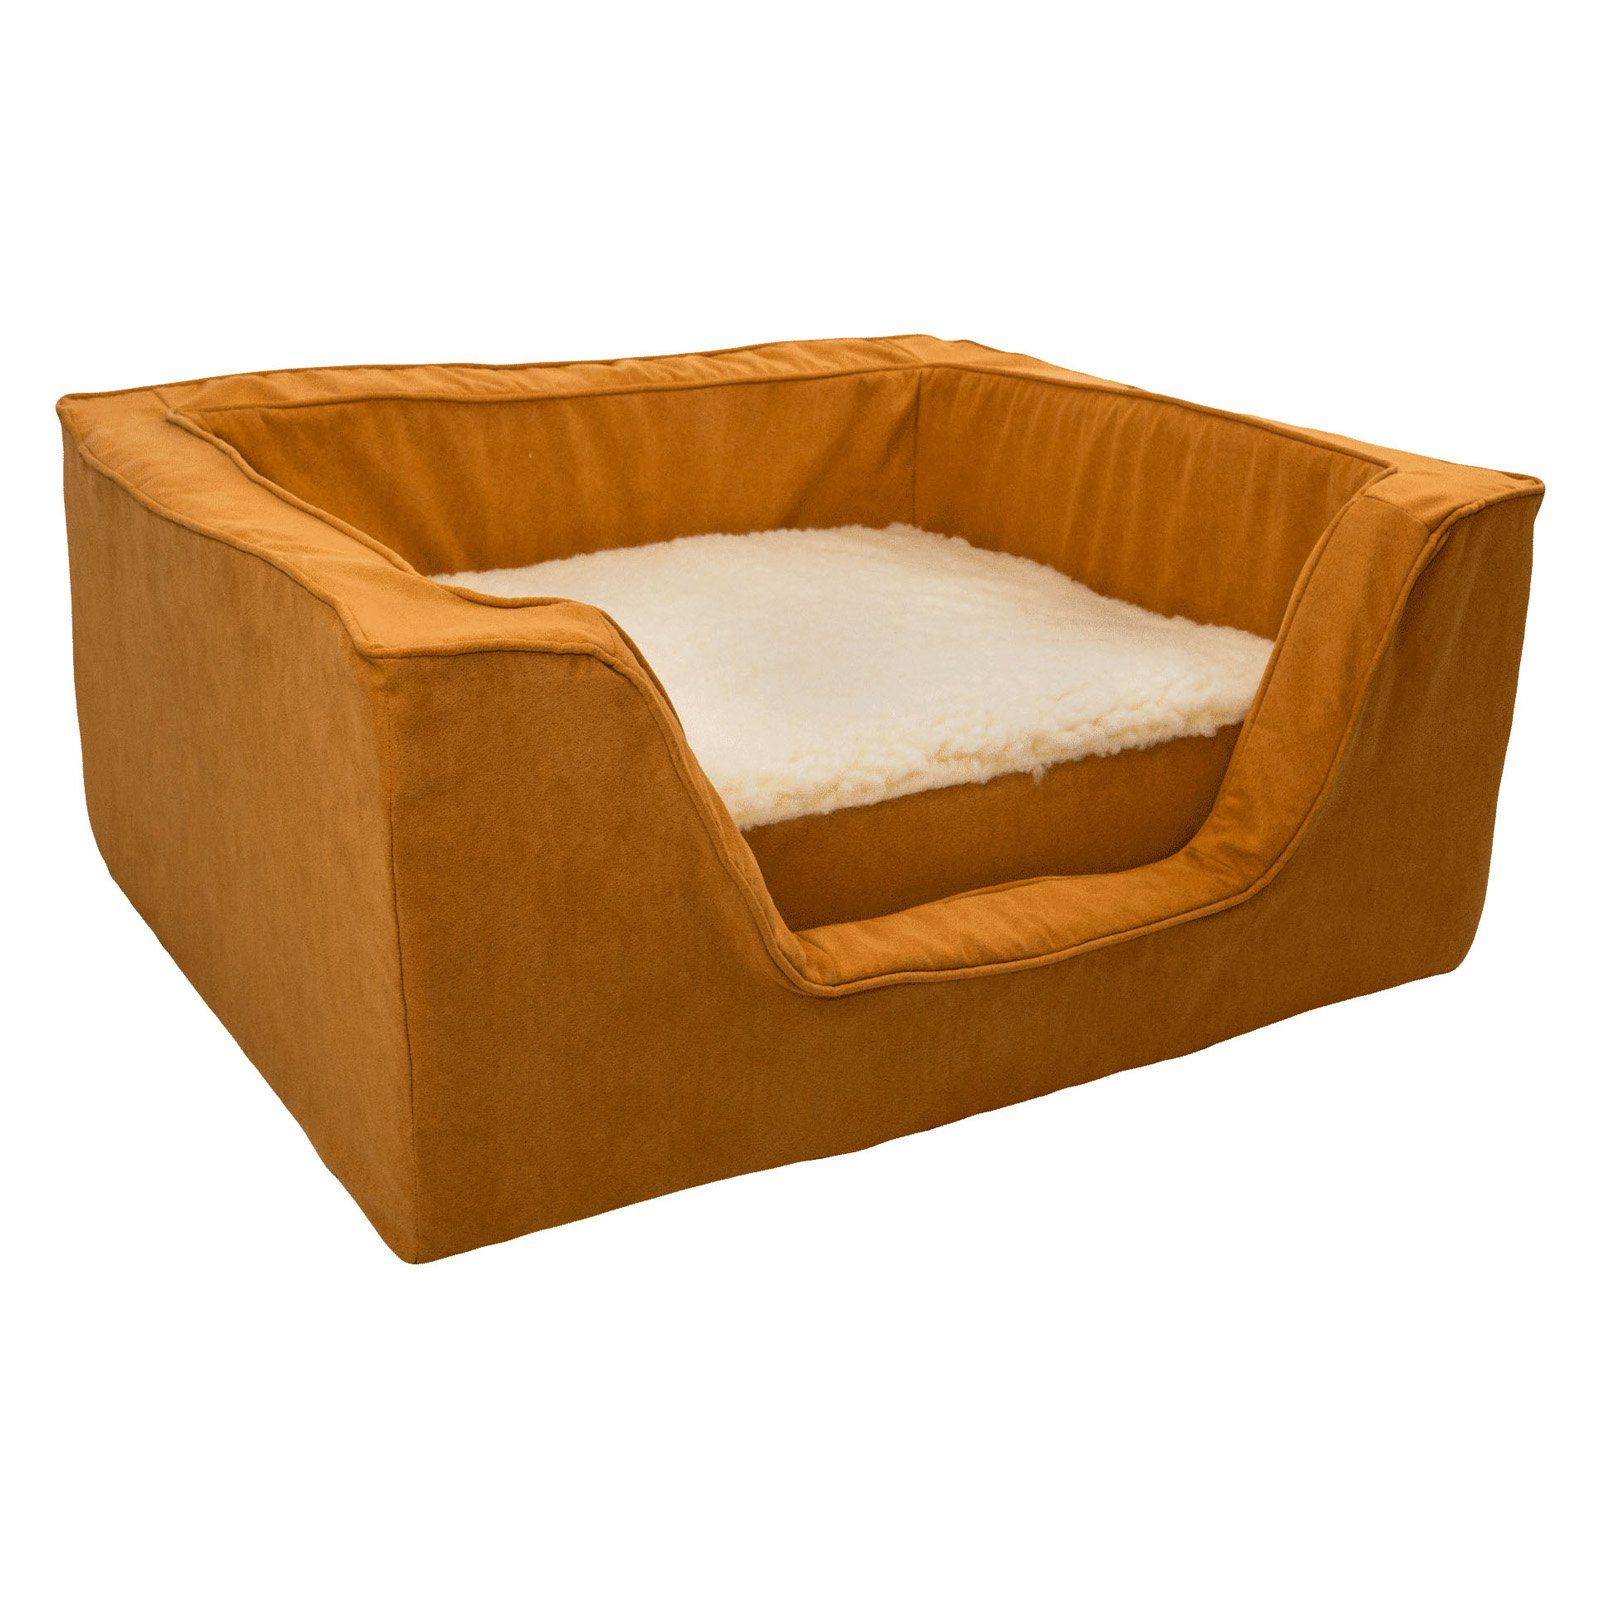 Snoozer Luxury Square Dog Bed with Memory Foam Orangeade